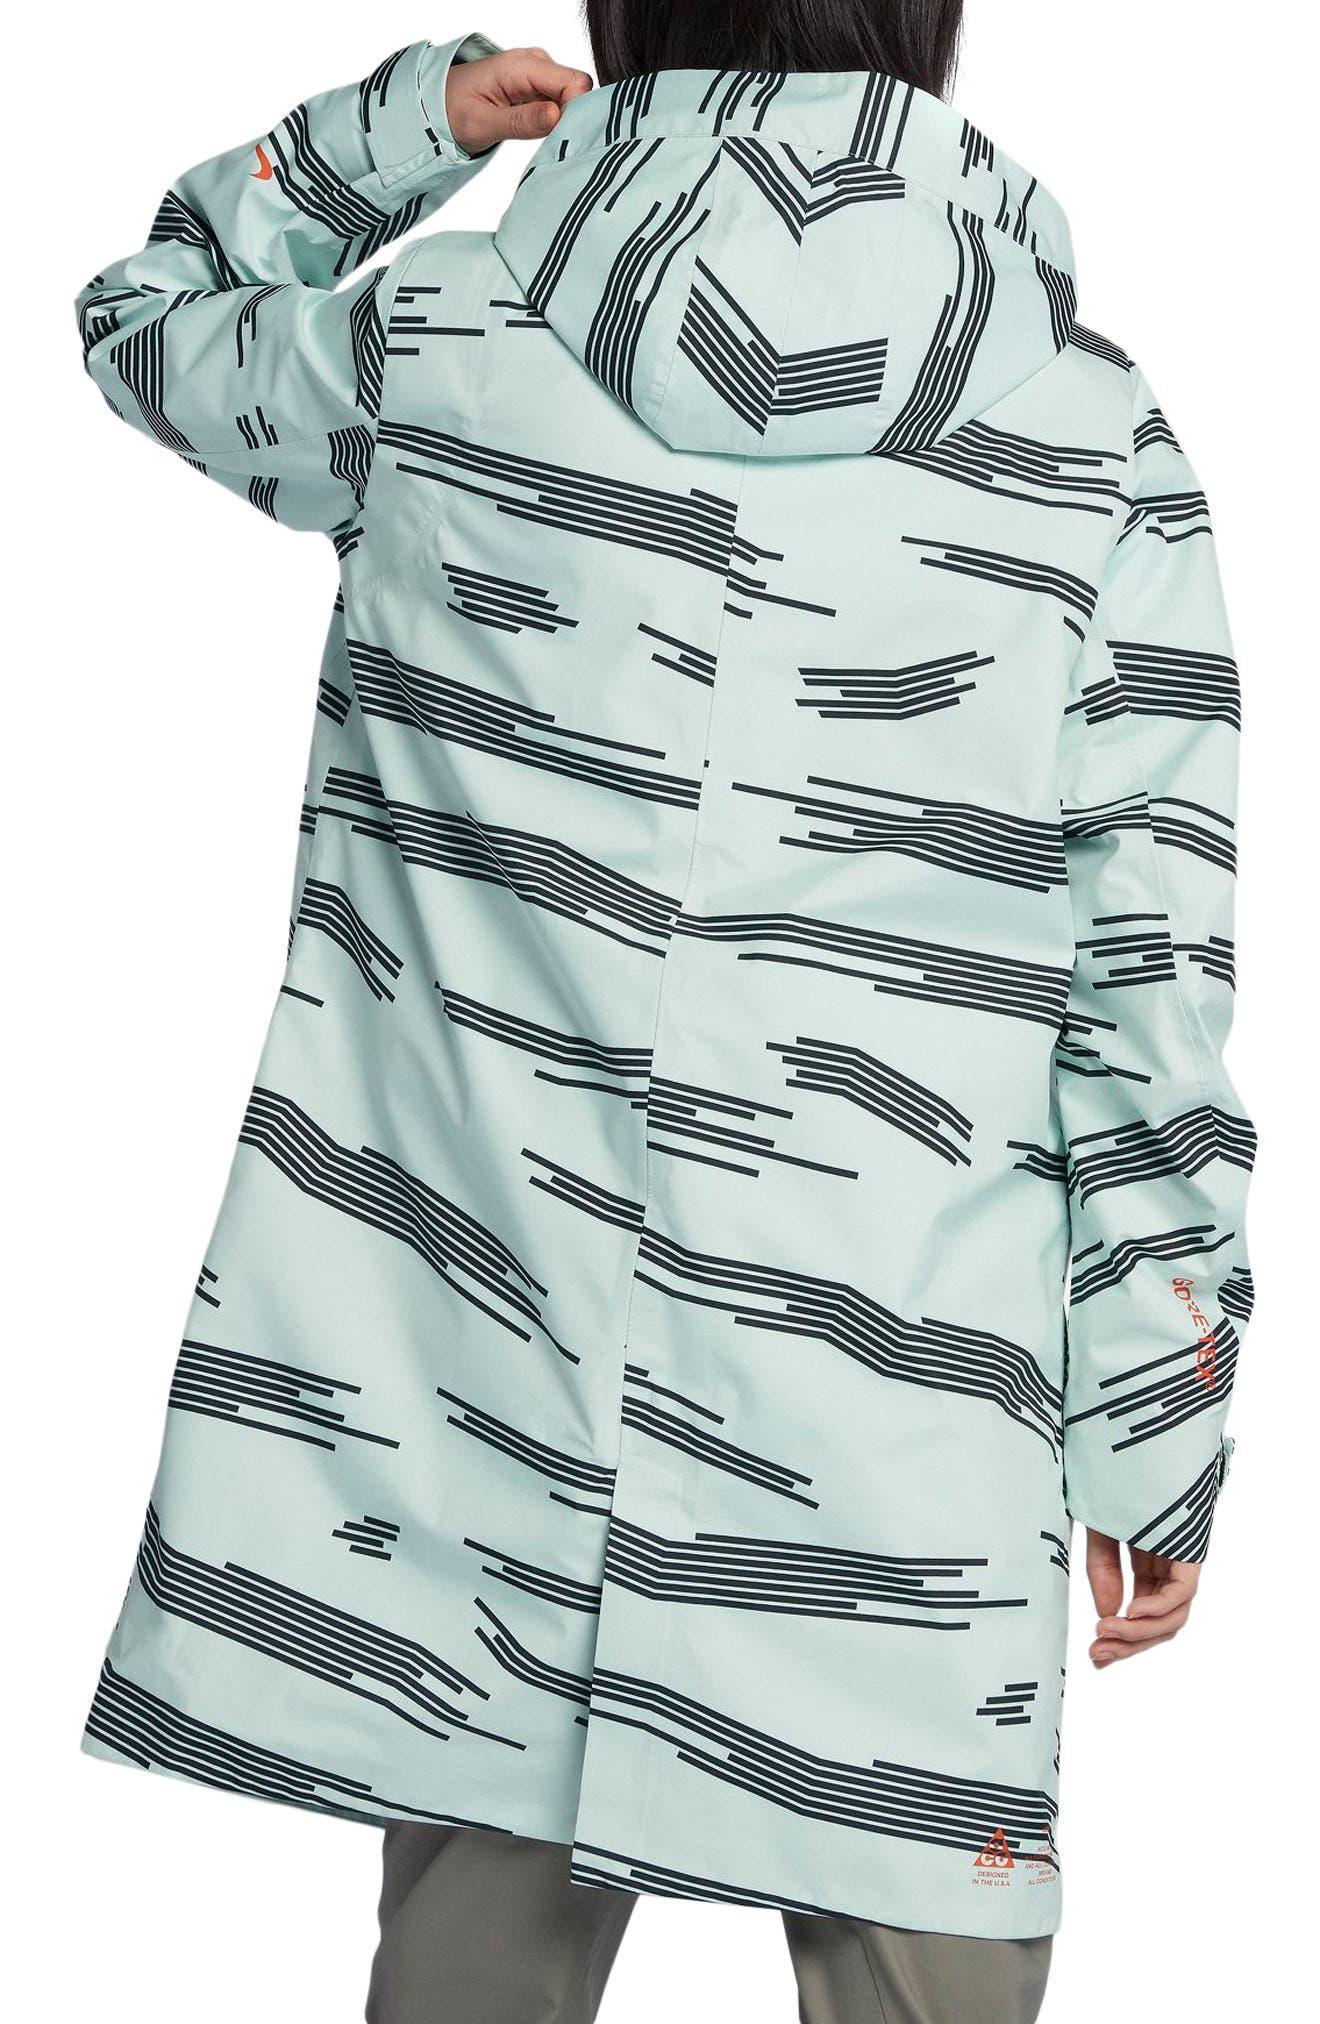 NikeLab ACG 3-in-1 System Women's Coat,                             Alternate thumbnail 3, color,                             Barely Green/ Black